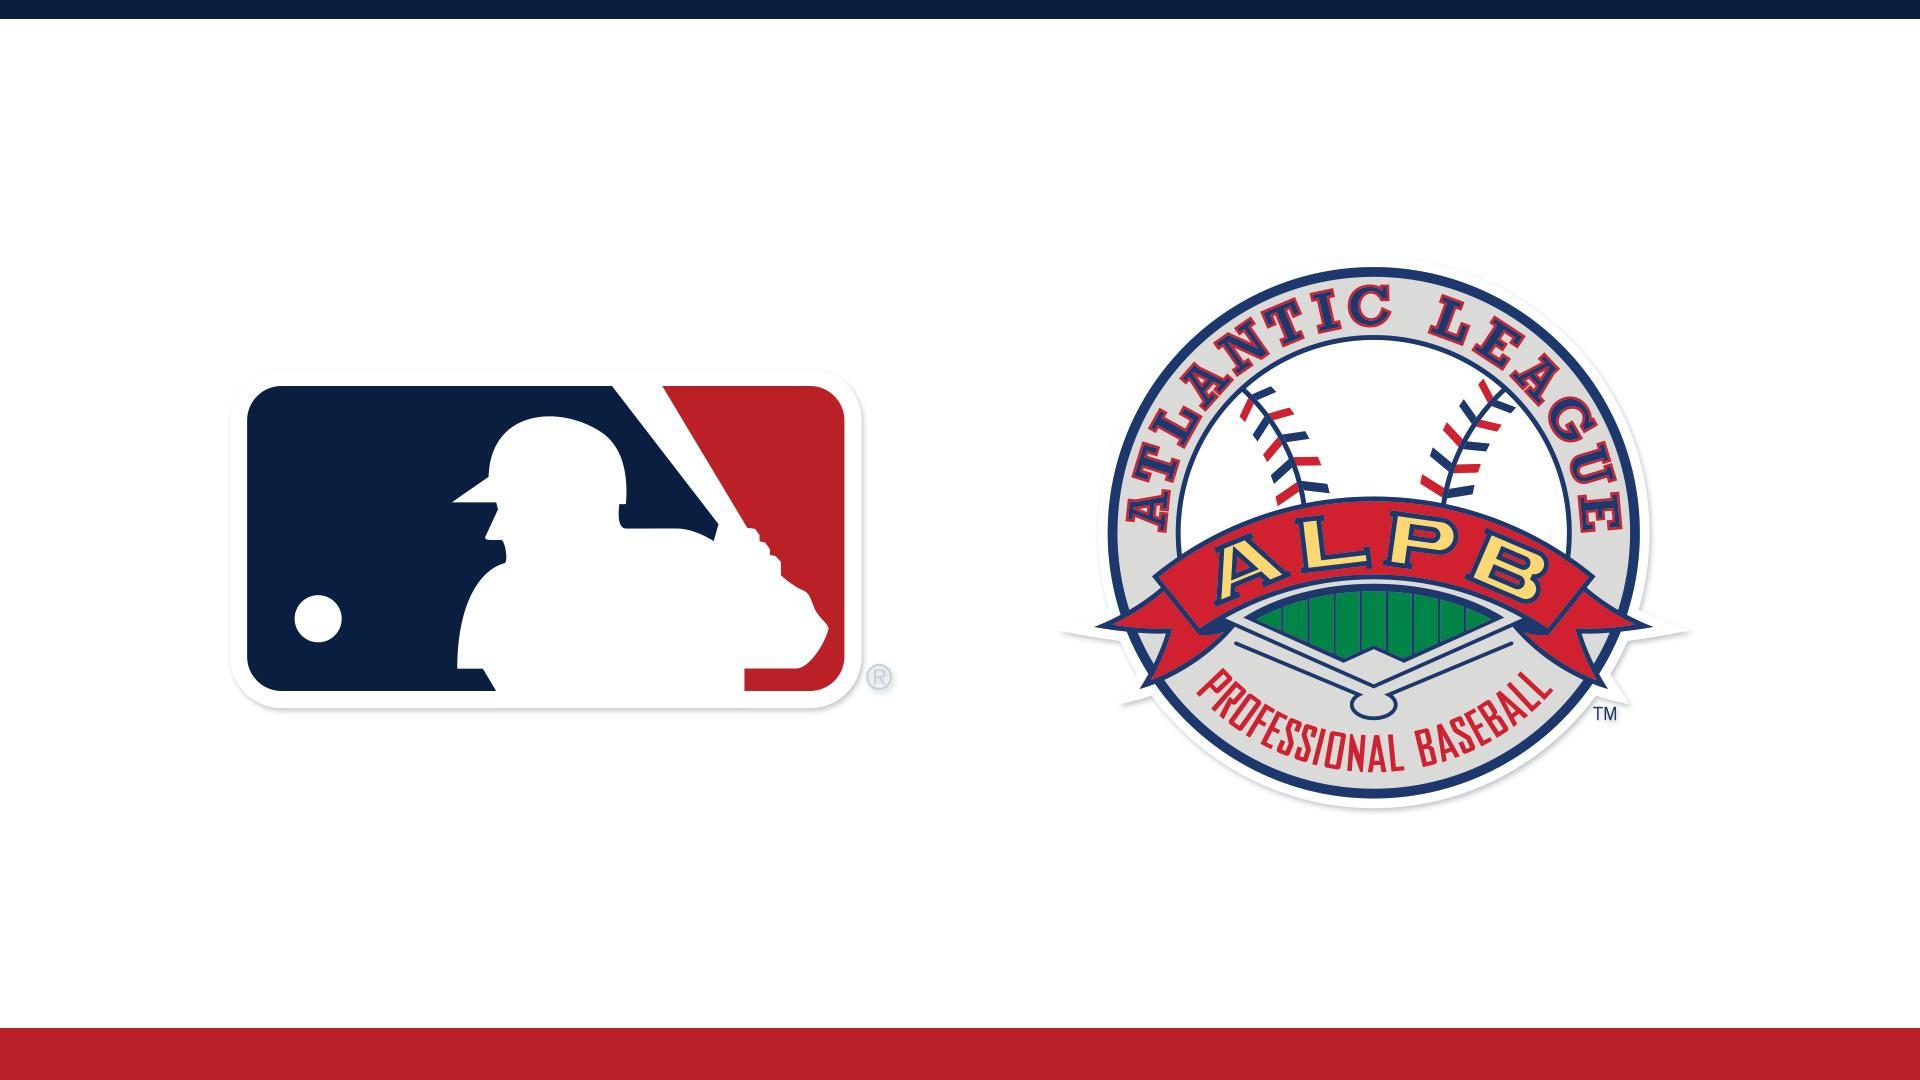 MLB, ATLANTIC LEAGUE ANNOUNCE EXPERIMENTAL PLAYING RULES FOR 2021 ATLANTIC LEAGUE SEASON